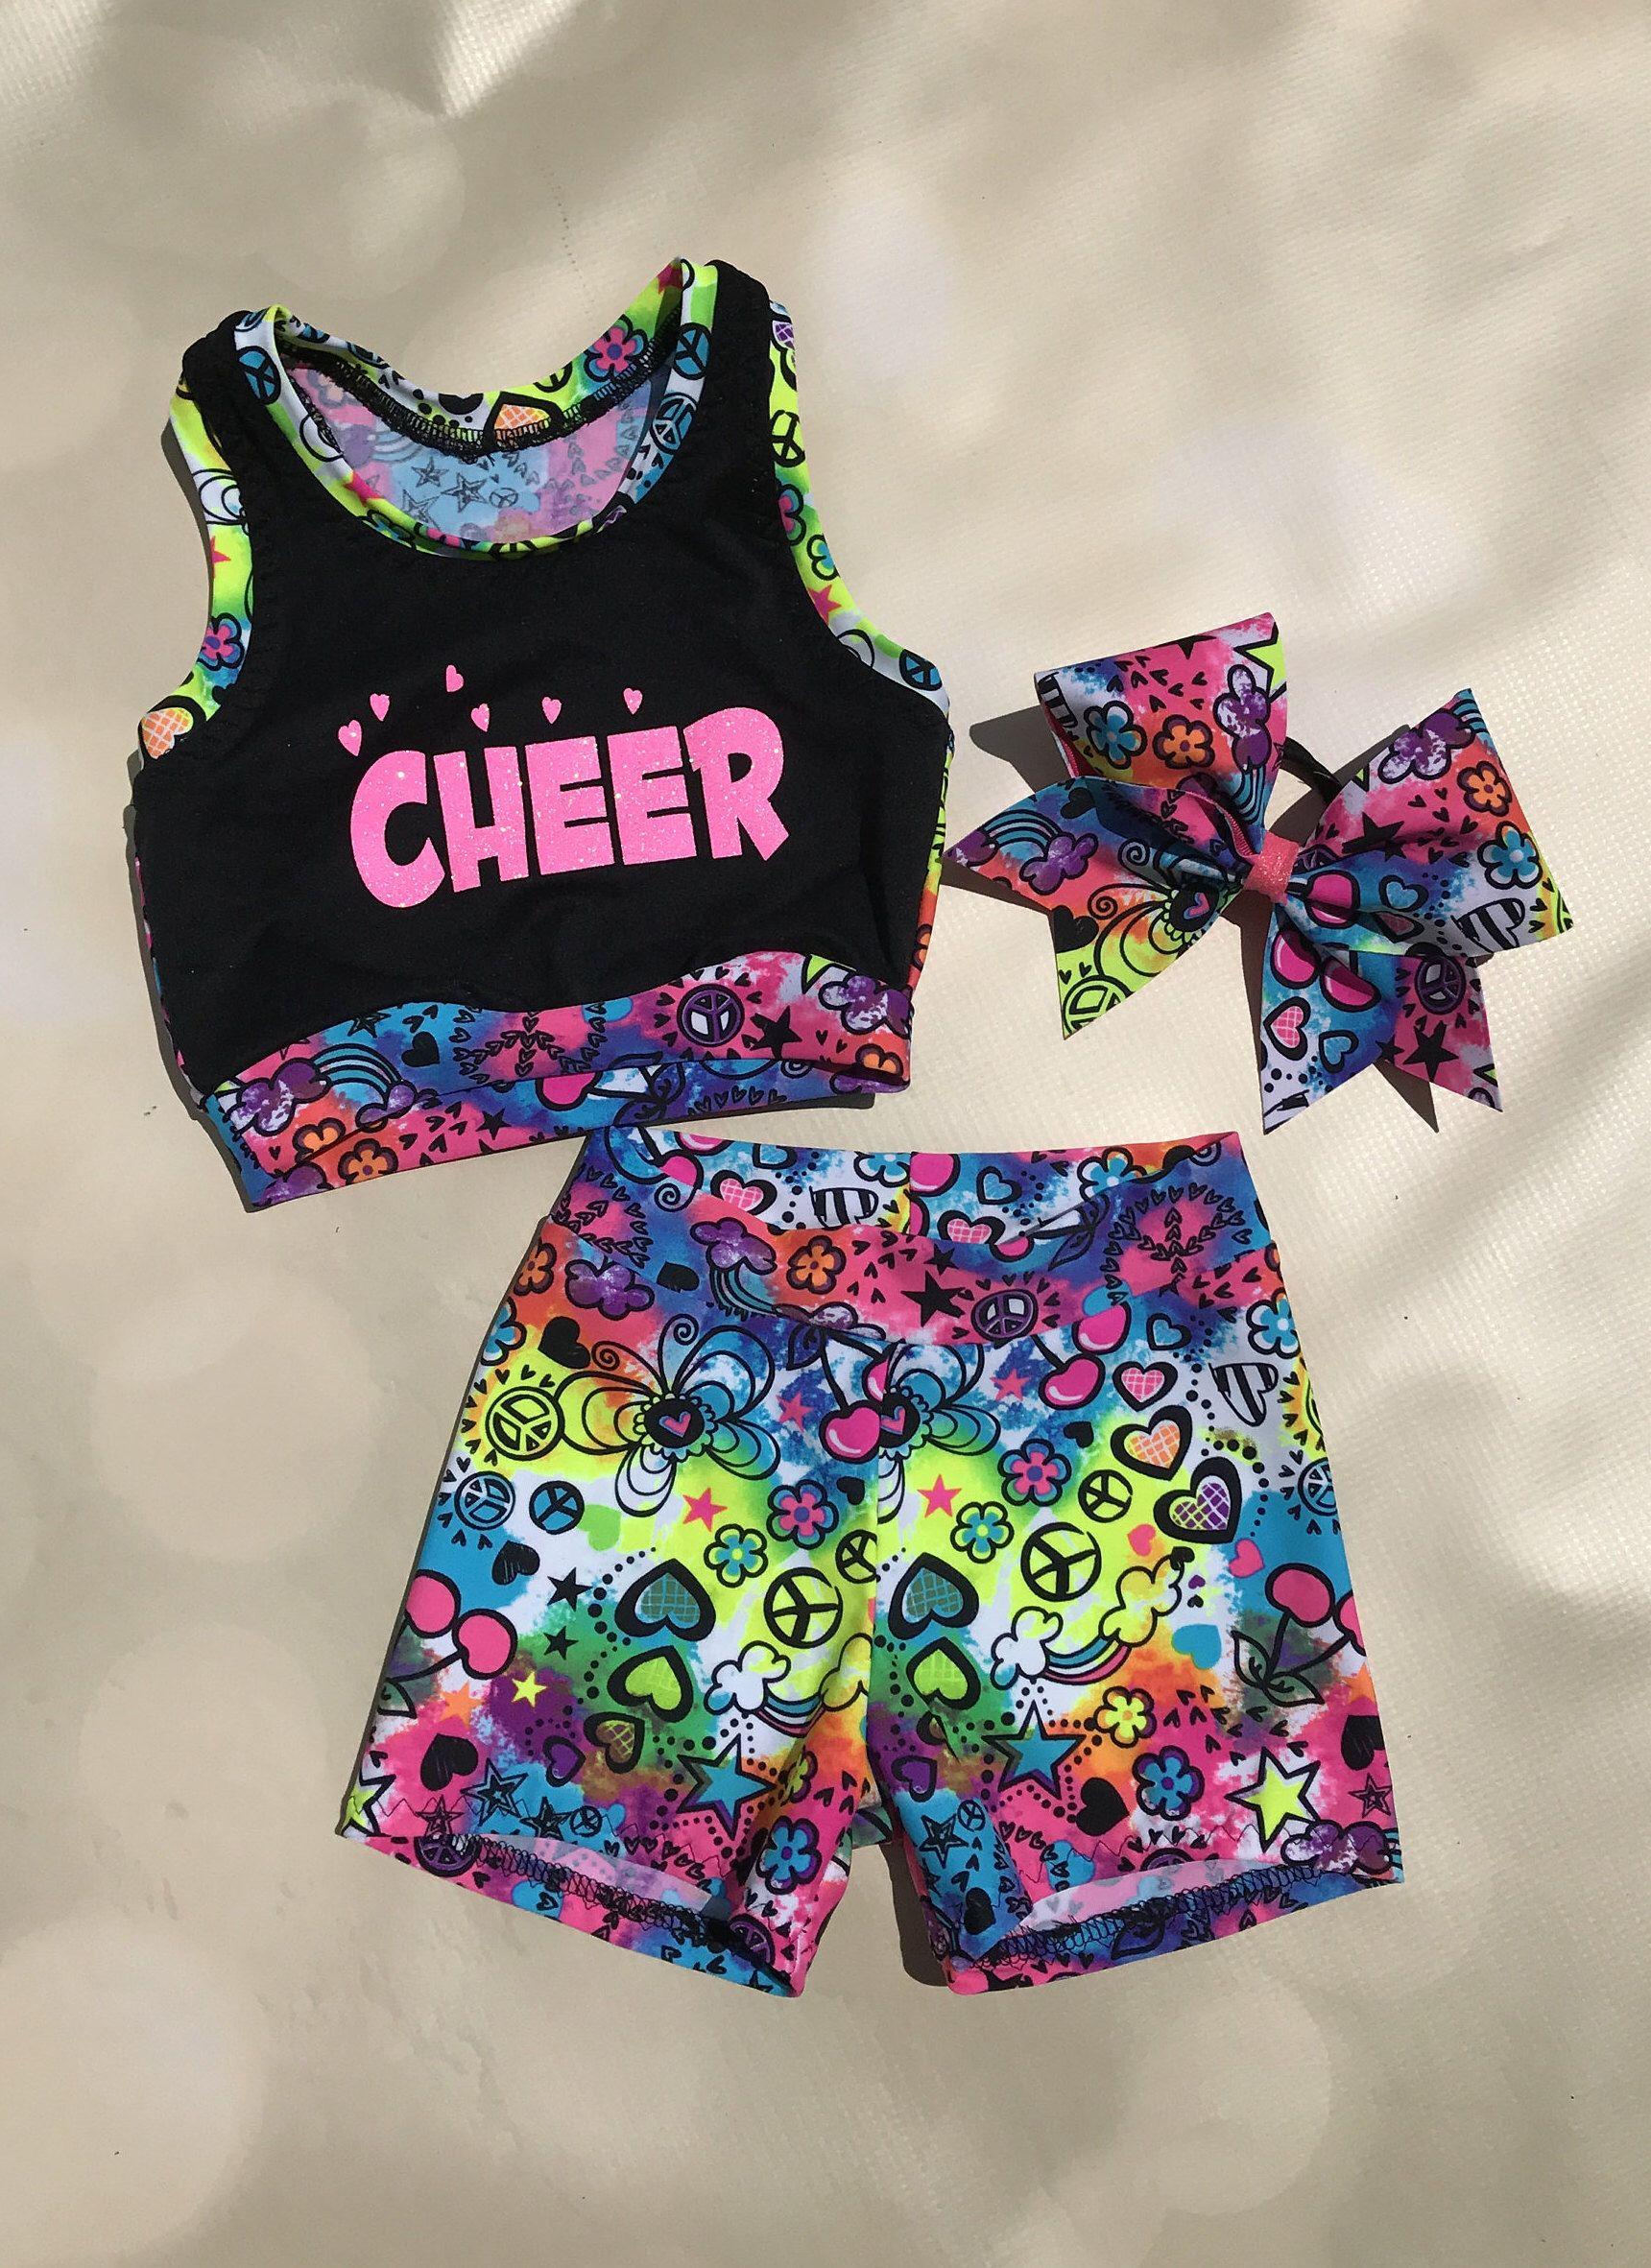 Dance Chevron Short Set,Cheer Chevron Short Set,Dancewear,Cheer Wear,Dance Outfit,Cheer Outfit,Activewear,Cheer Top,Dance Top,Dance Set